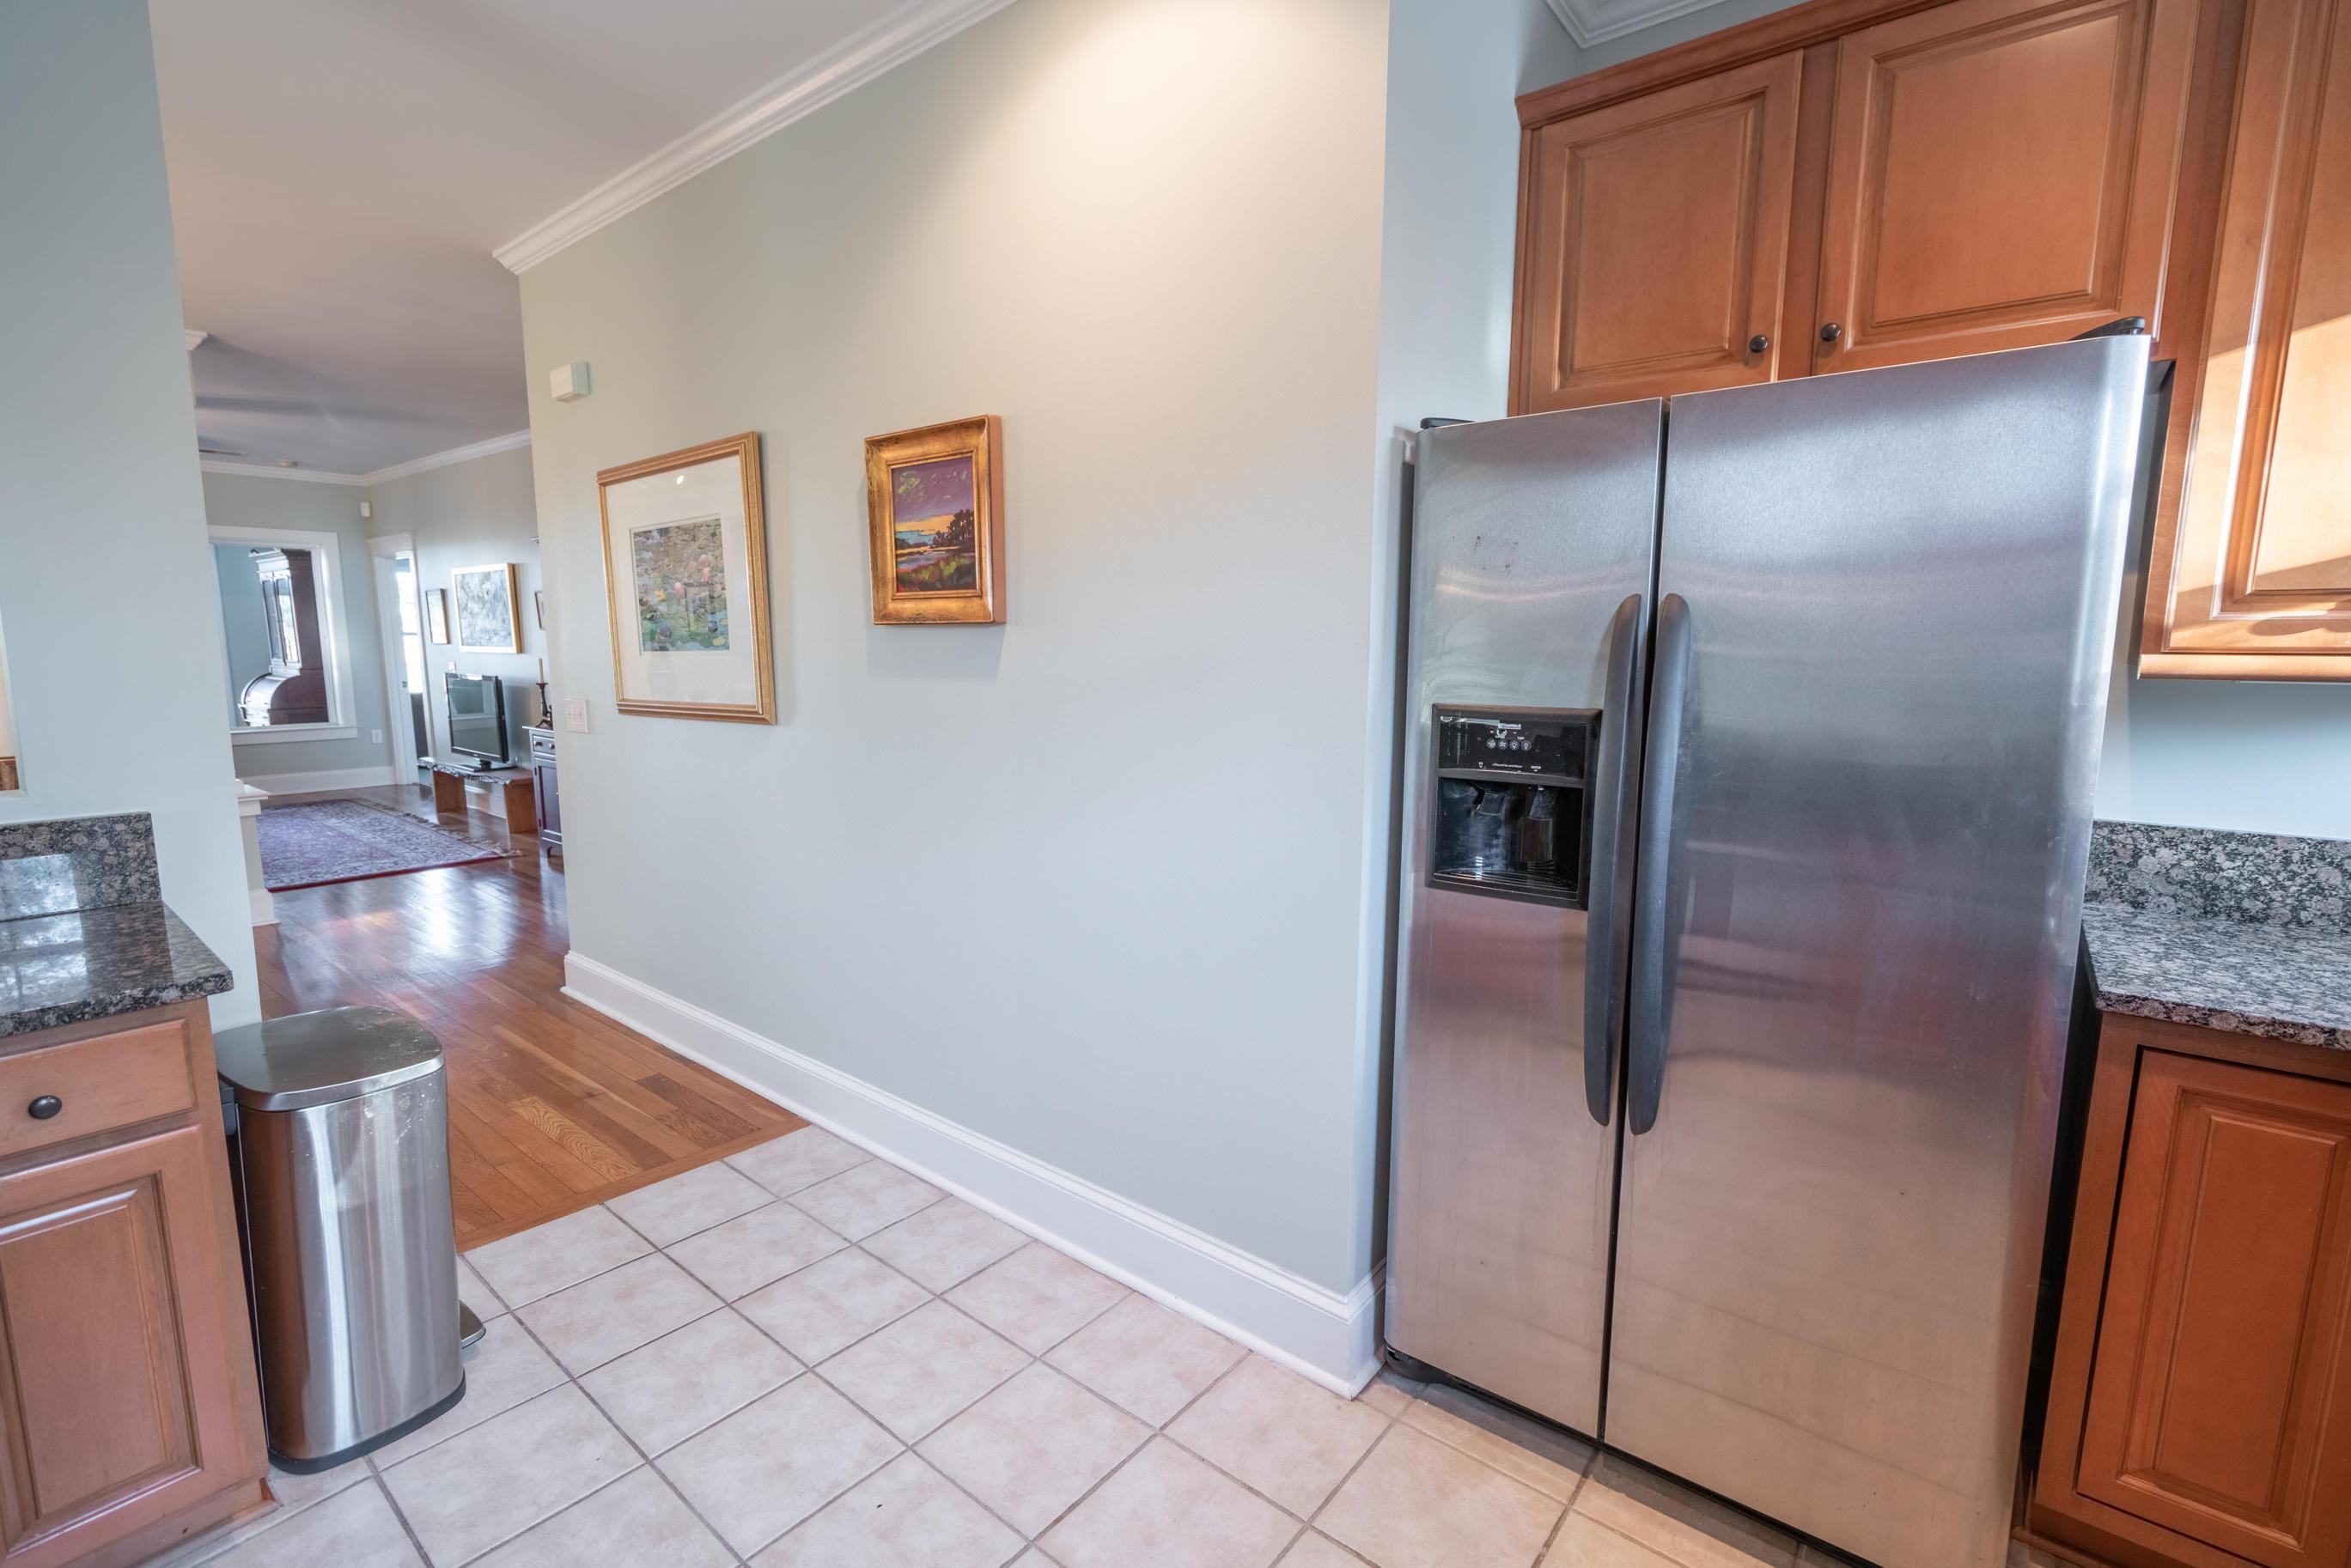 Etiwan Pointe Homes For Sale - 132 Winding Creek, Mount Pleasant, SC - 24